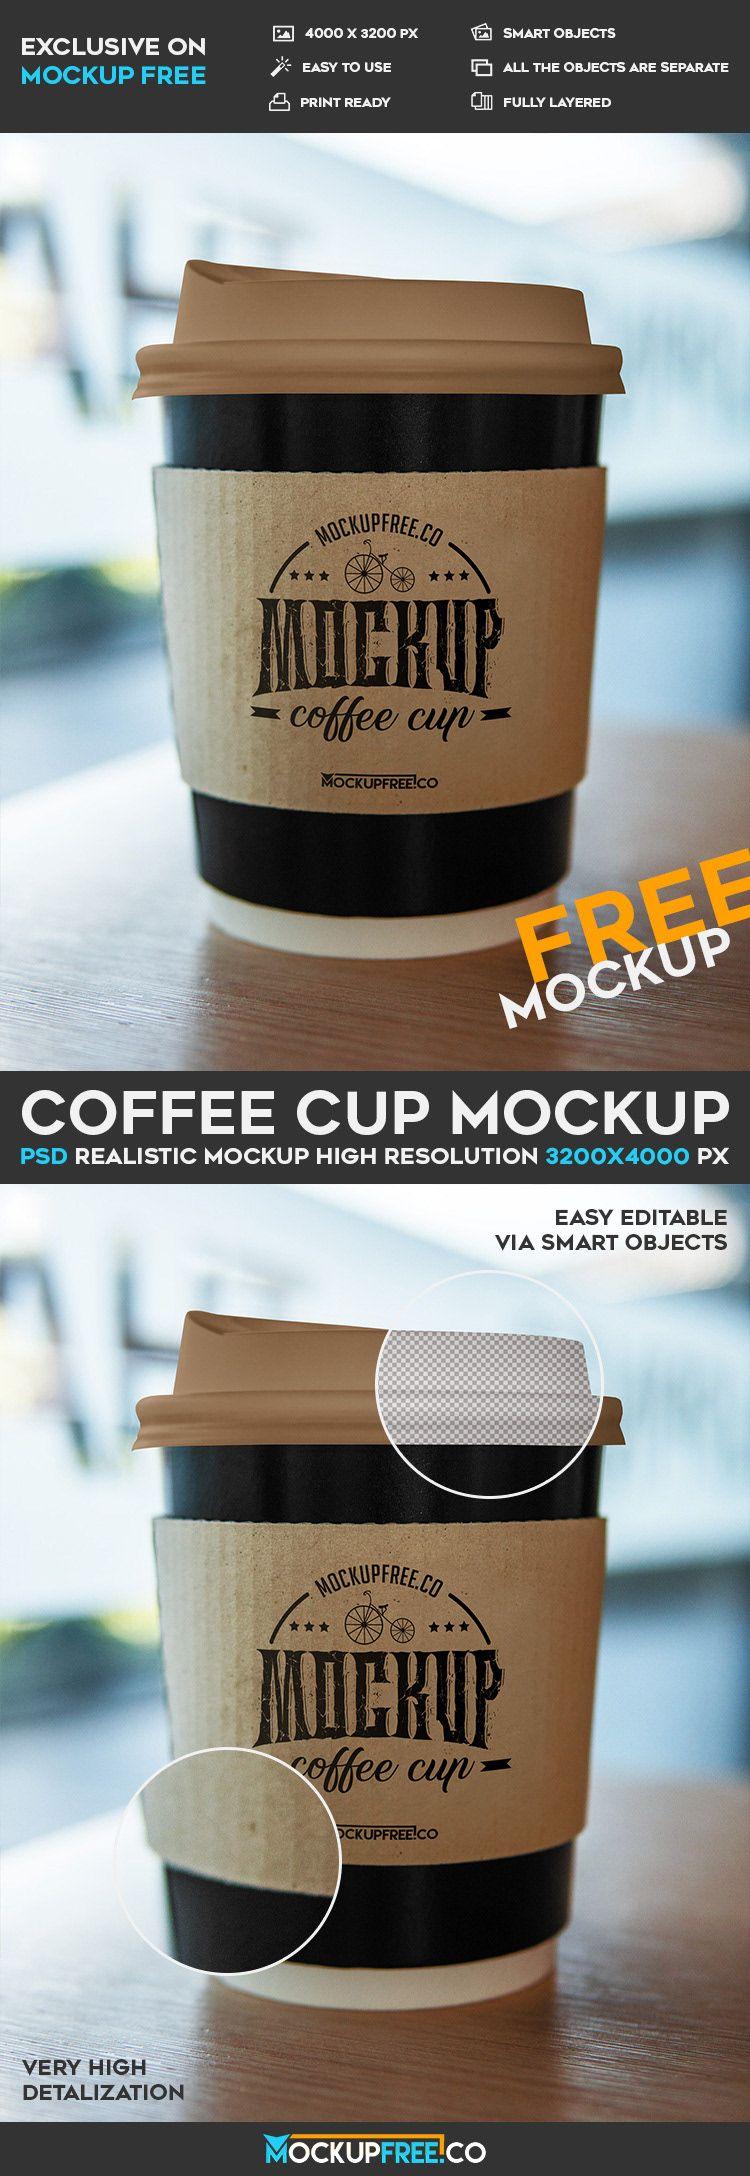 Coffee Cup Free PSD Mockup on Behance imagens)